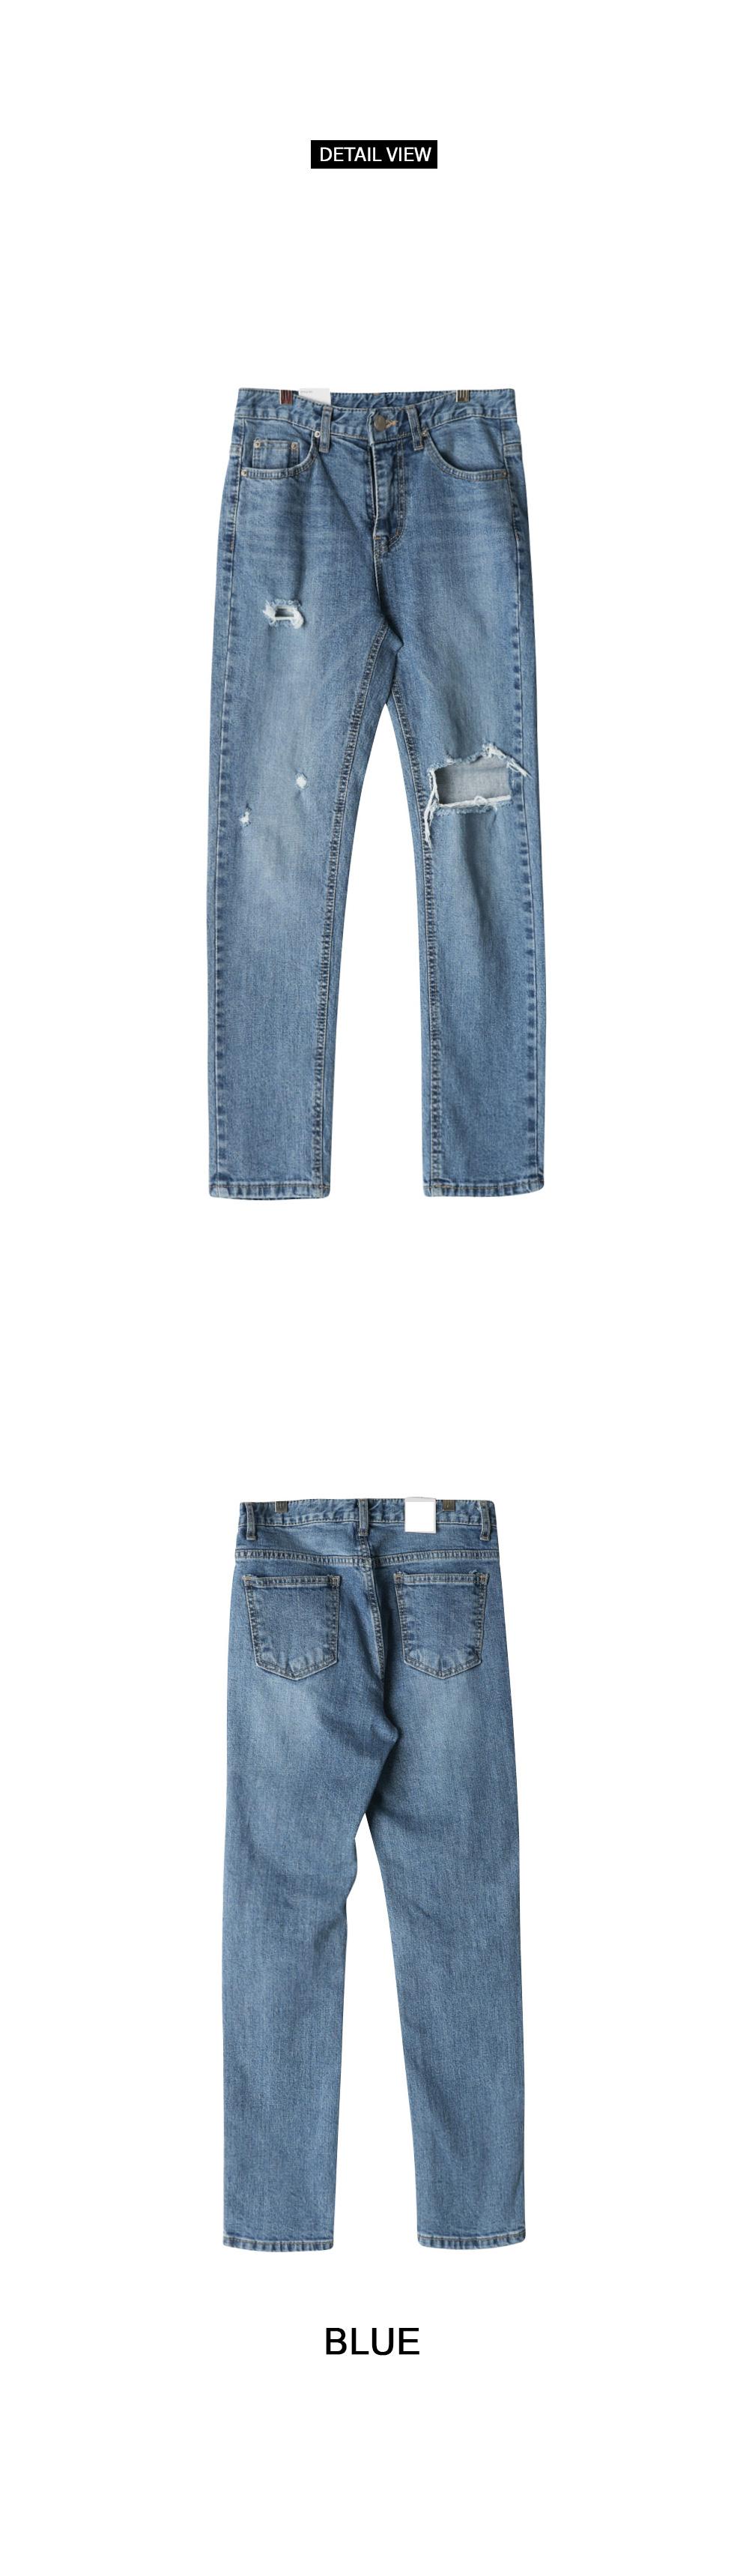 Clover Date Denim Pants